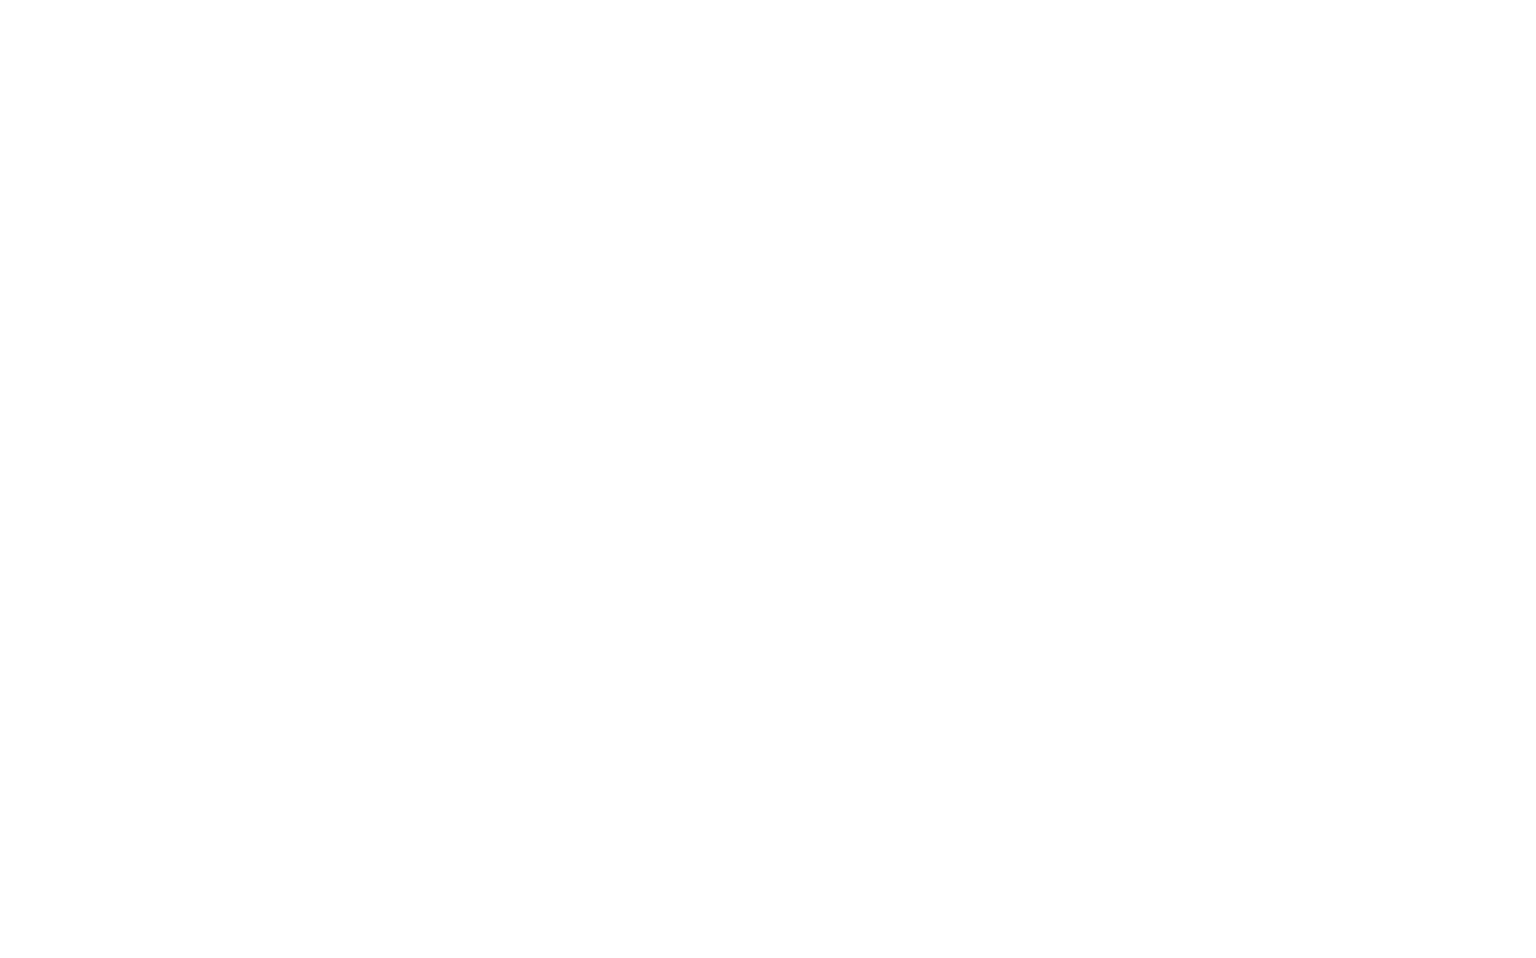 Bulldog 100 10th Anniversary logo